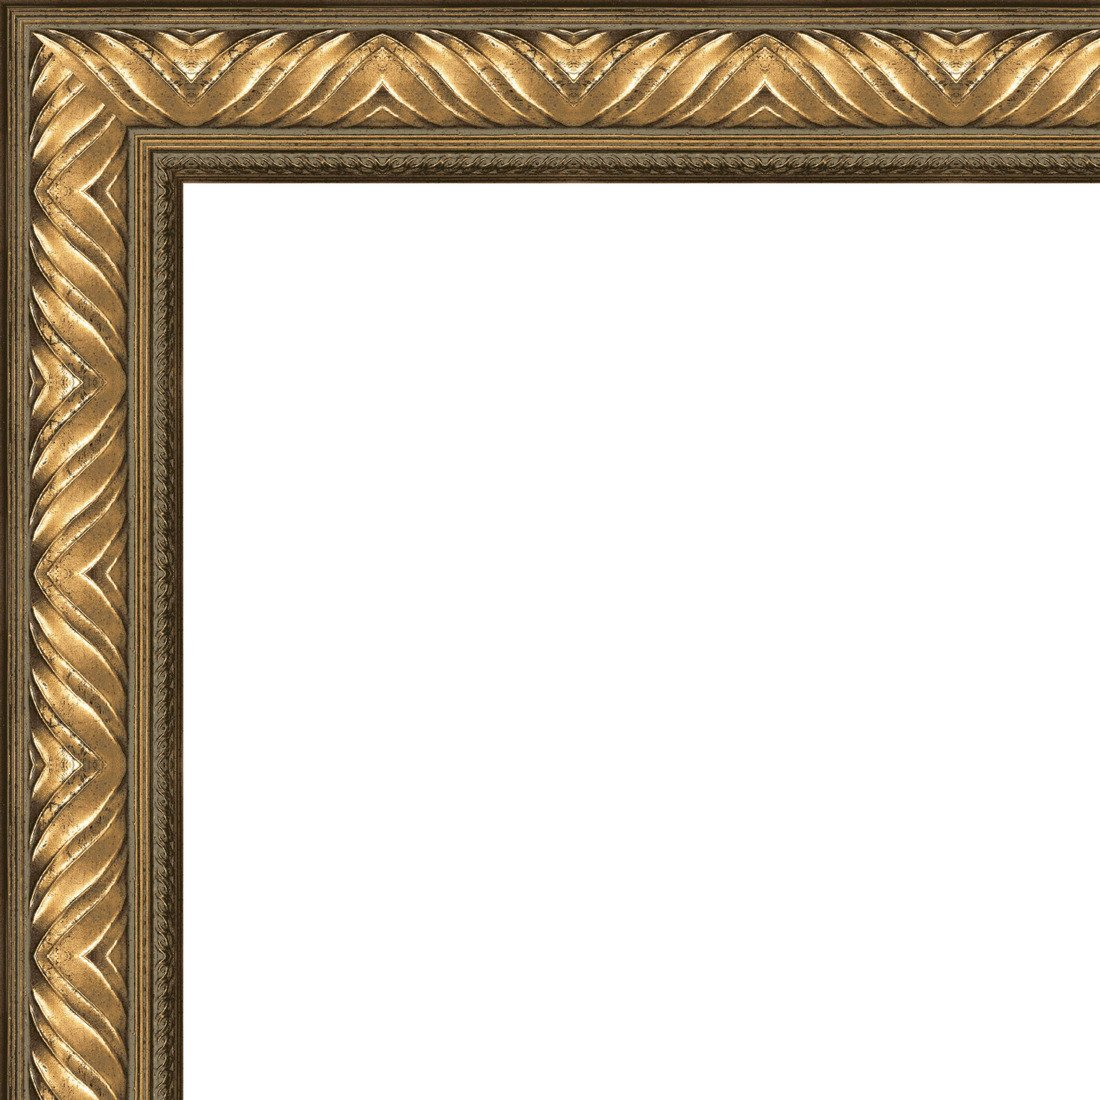 Picture Frame Moulding (Wood) 18ft bundle - Traditional Antique Gold Finish - 2.5'' width - 11/16'' rabbet depth